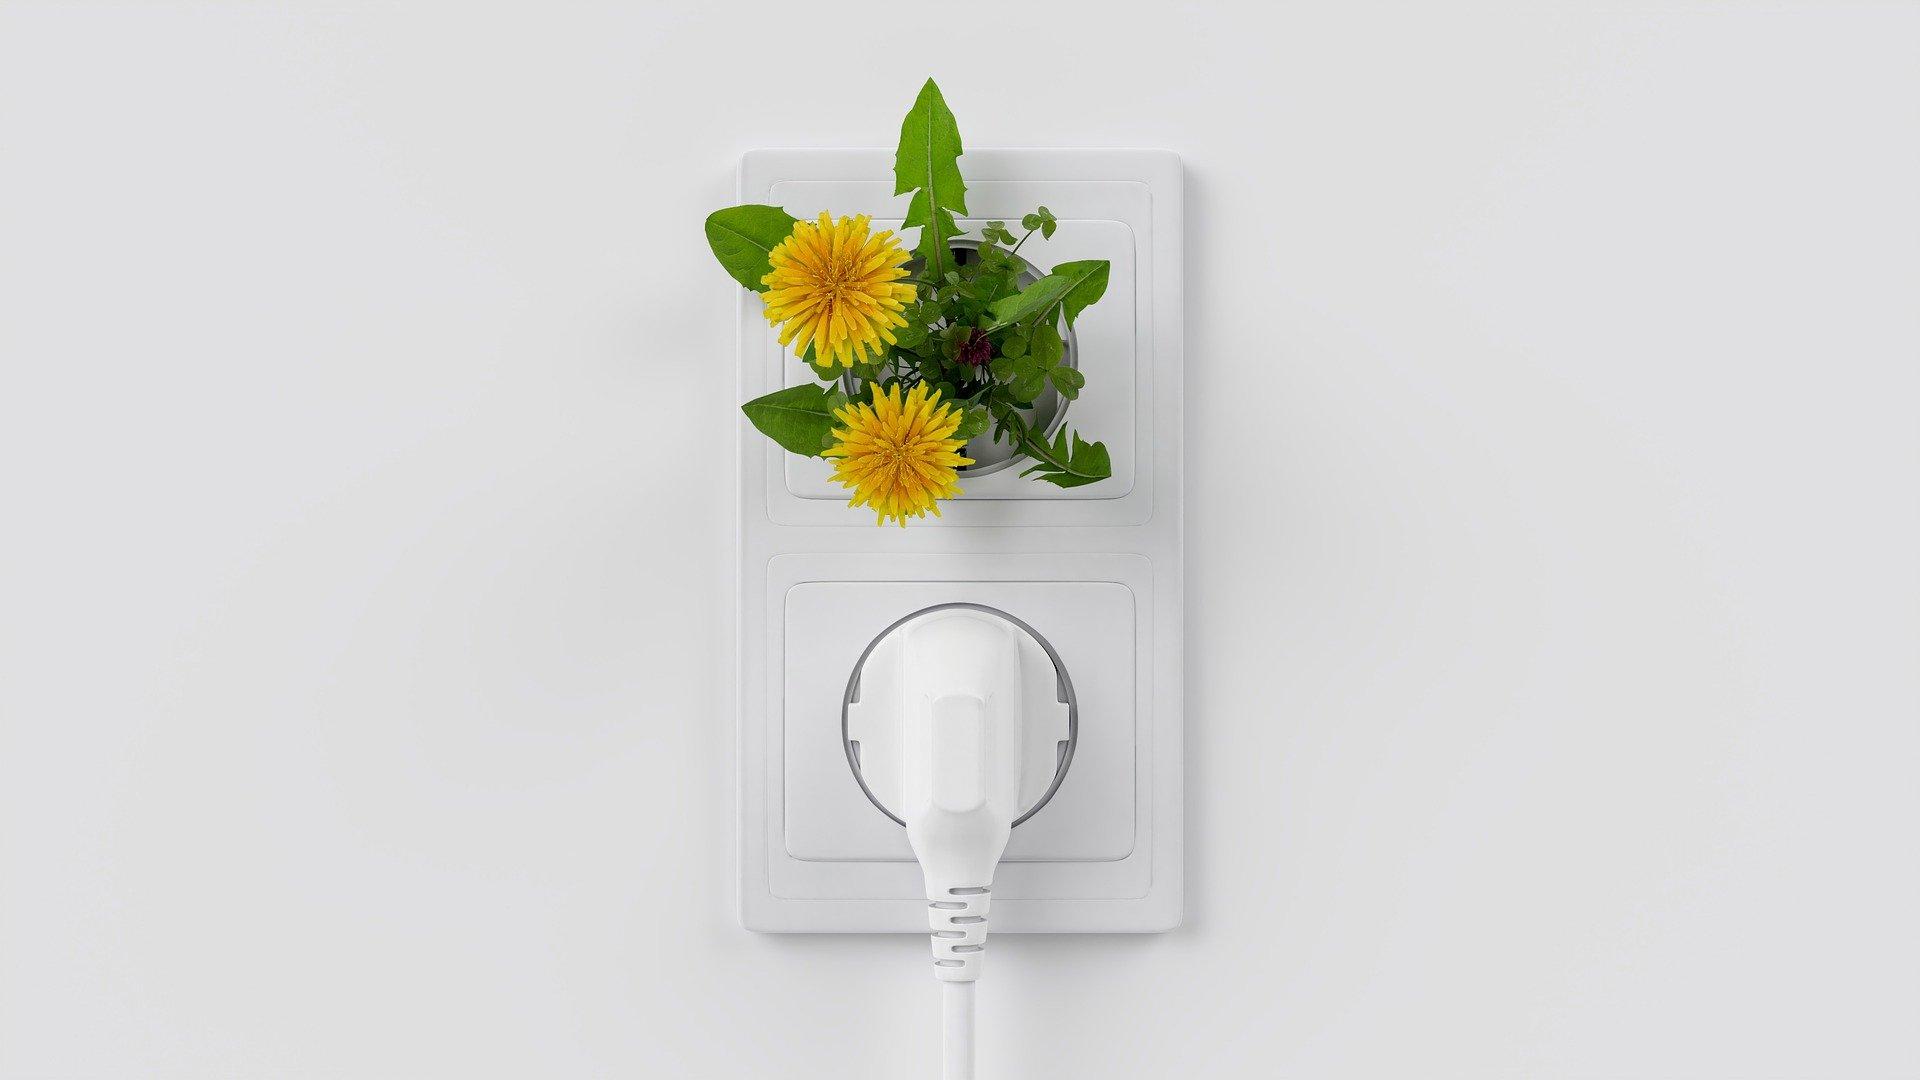 Photovoltaik - Das Bürokratie Problem